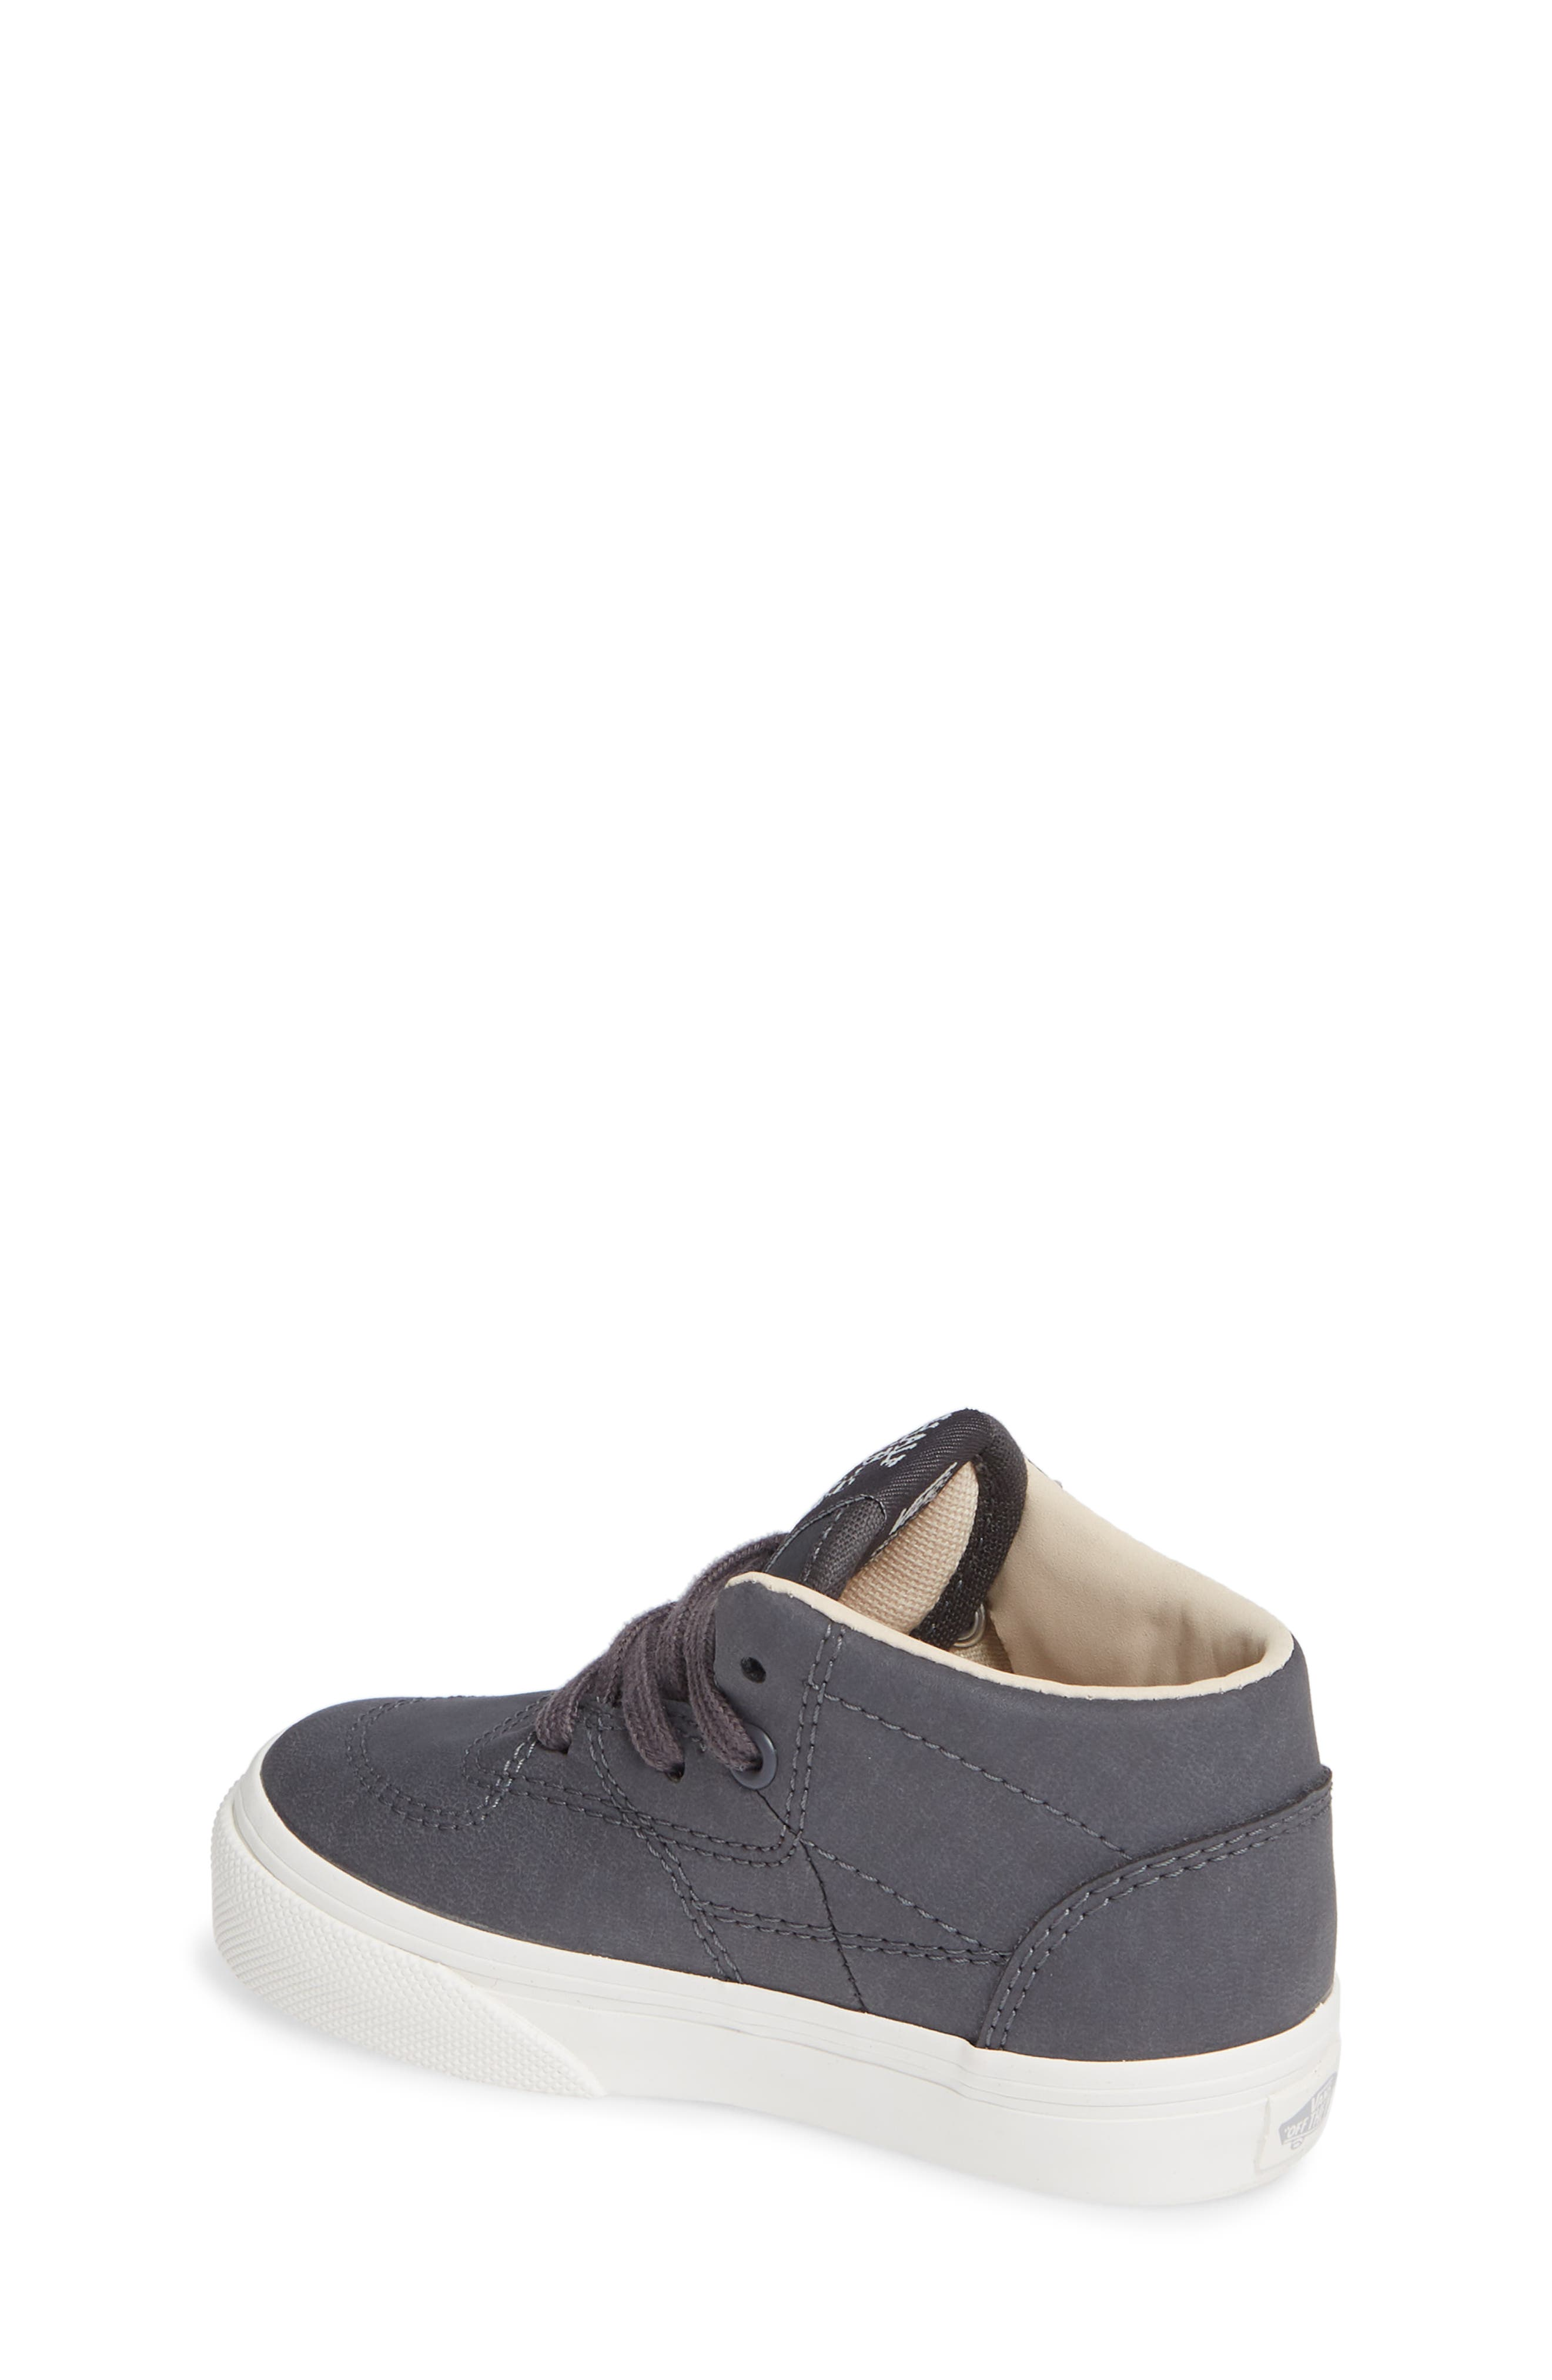 Half Cab Sneaker,                             Alternate thumbnail 2, color,                             VANSBUCK ASPHALT/ BLANC